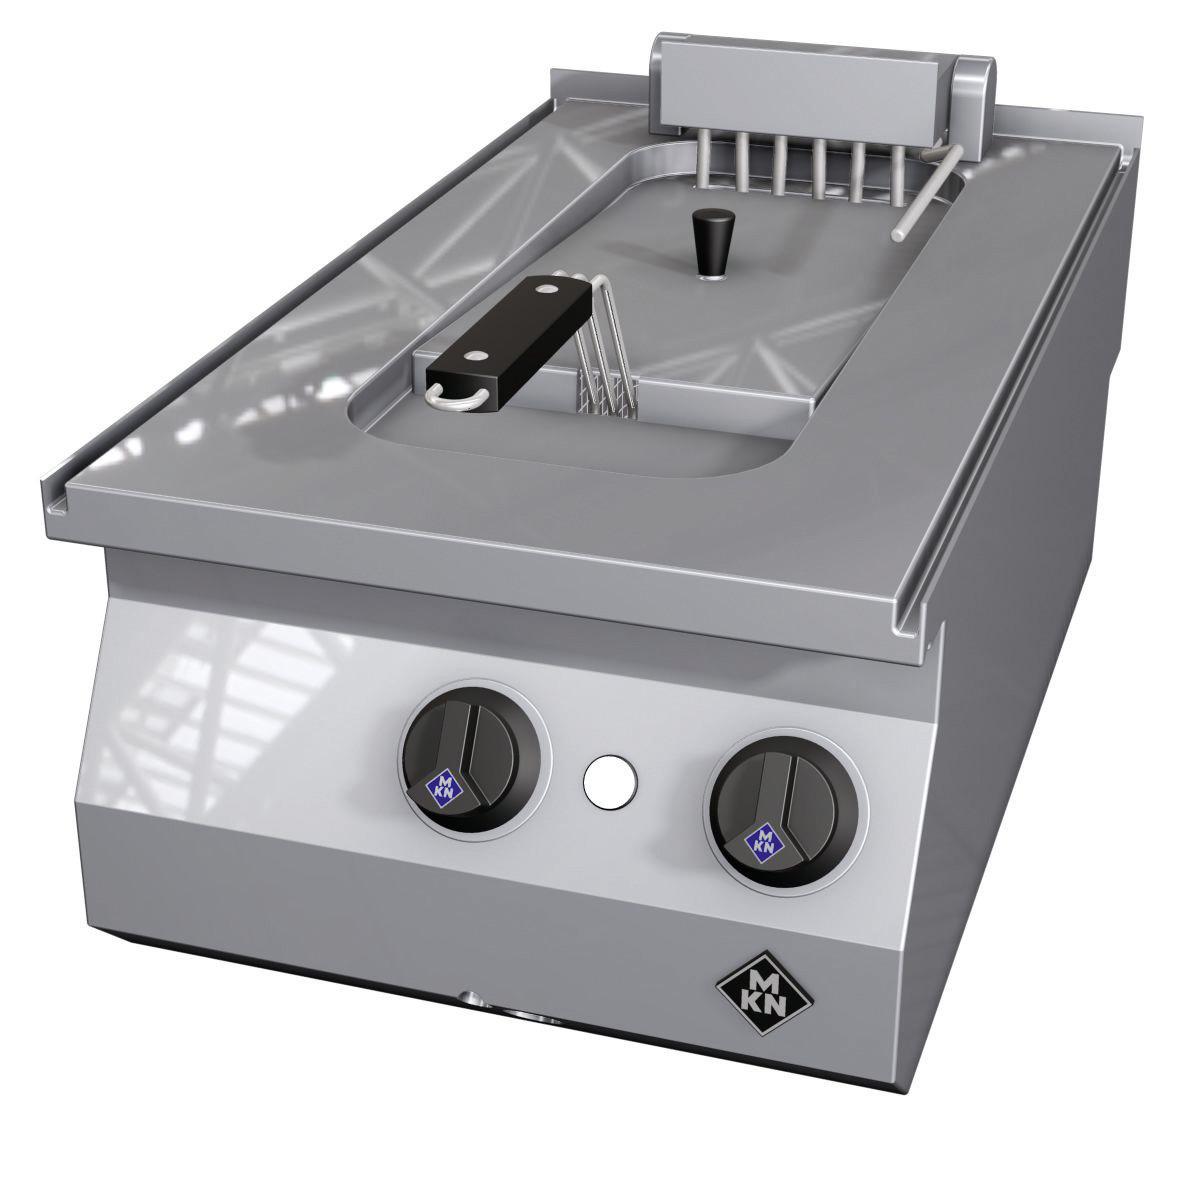 Elektro-Fritteuse 1 x 12,50 l / London I 6,00 kW / 400 x 700 x 270 mm/Counter SL